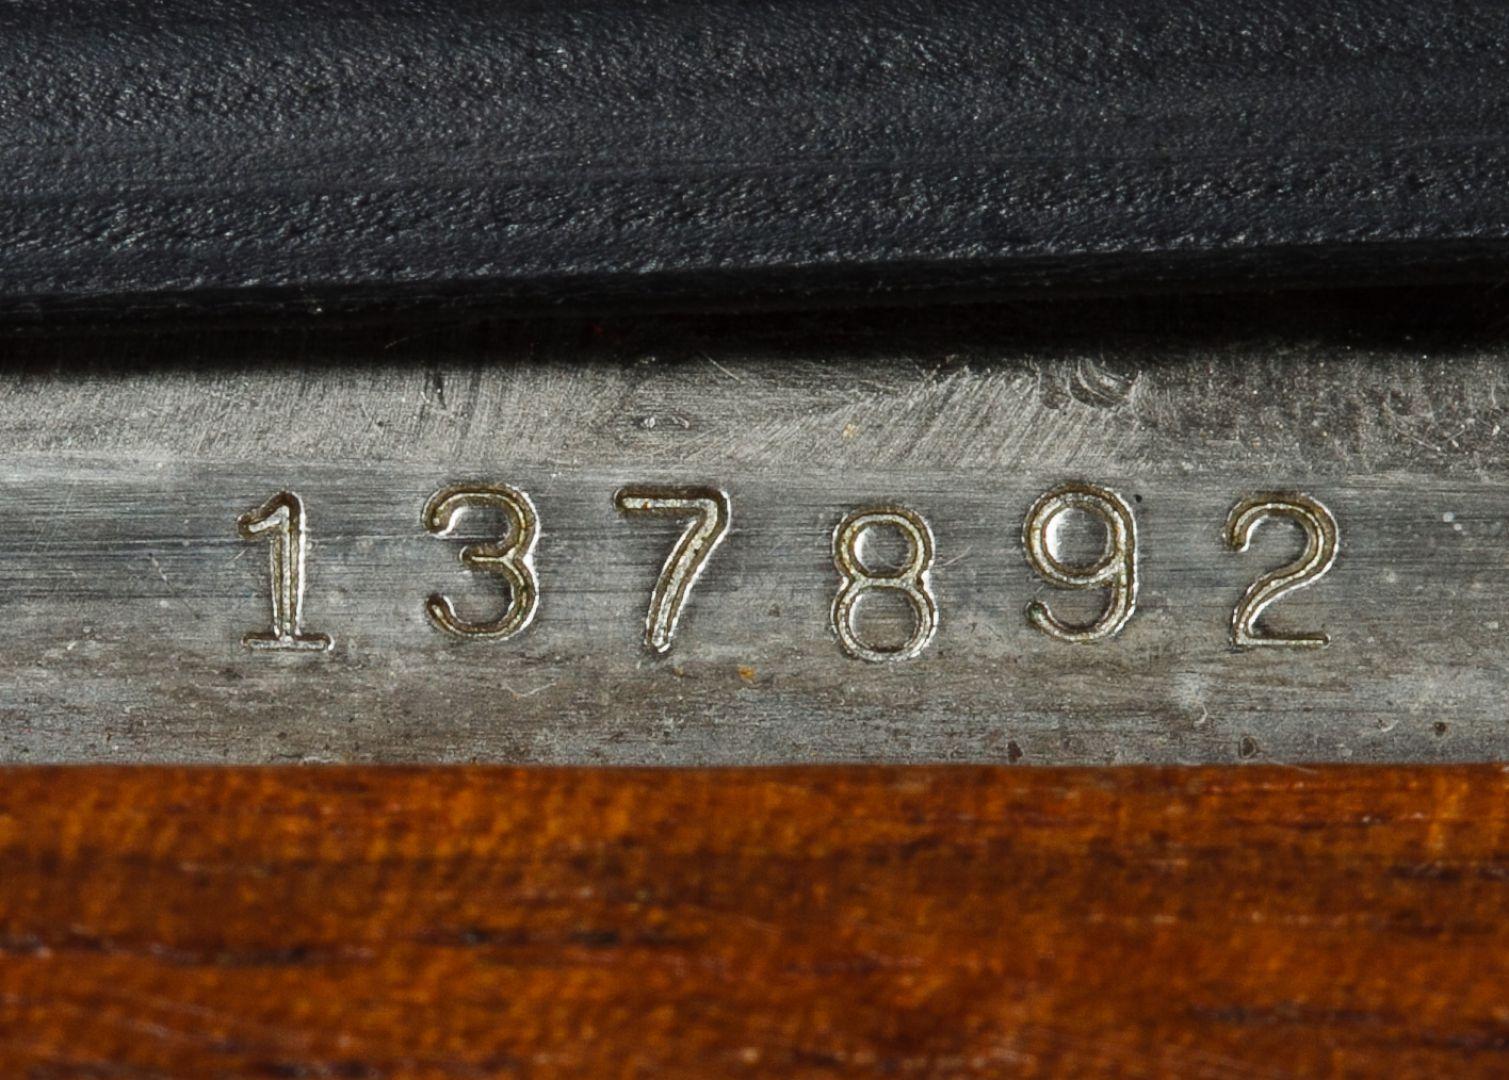 Lot 332 Sheridan Silver Streak 5mm Pellet Rifle Serial